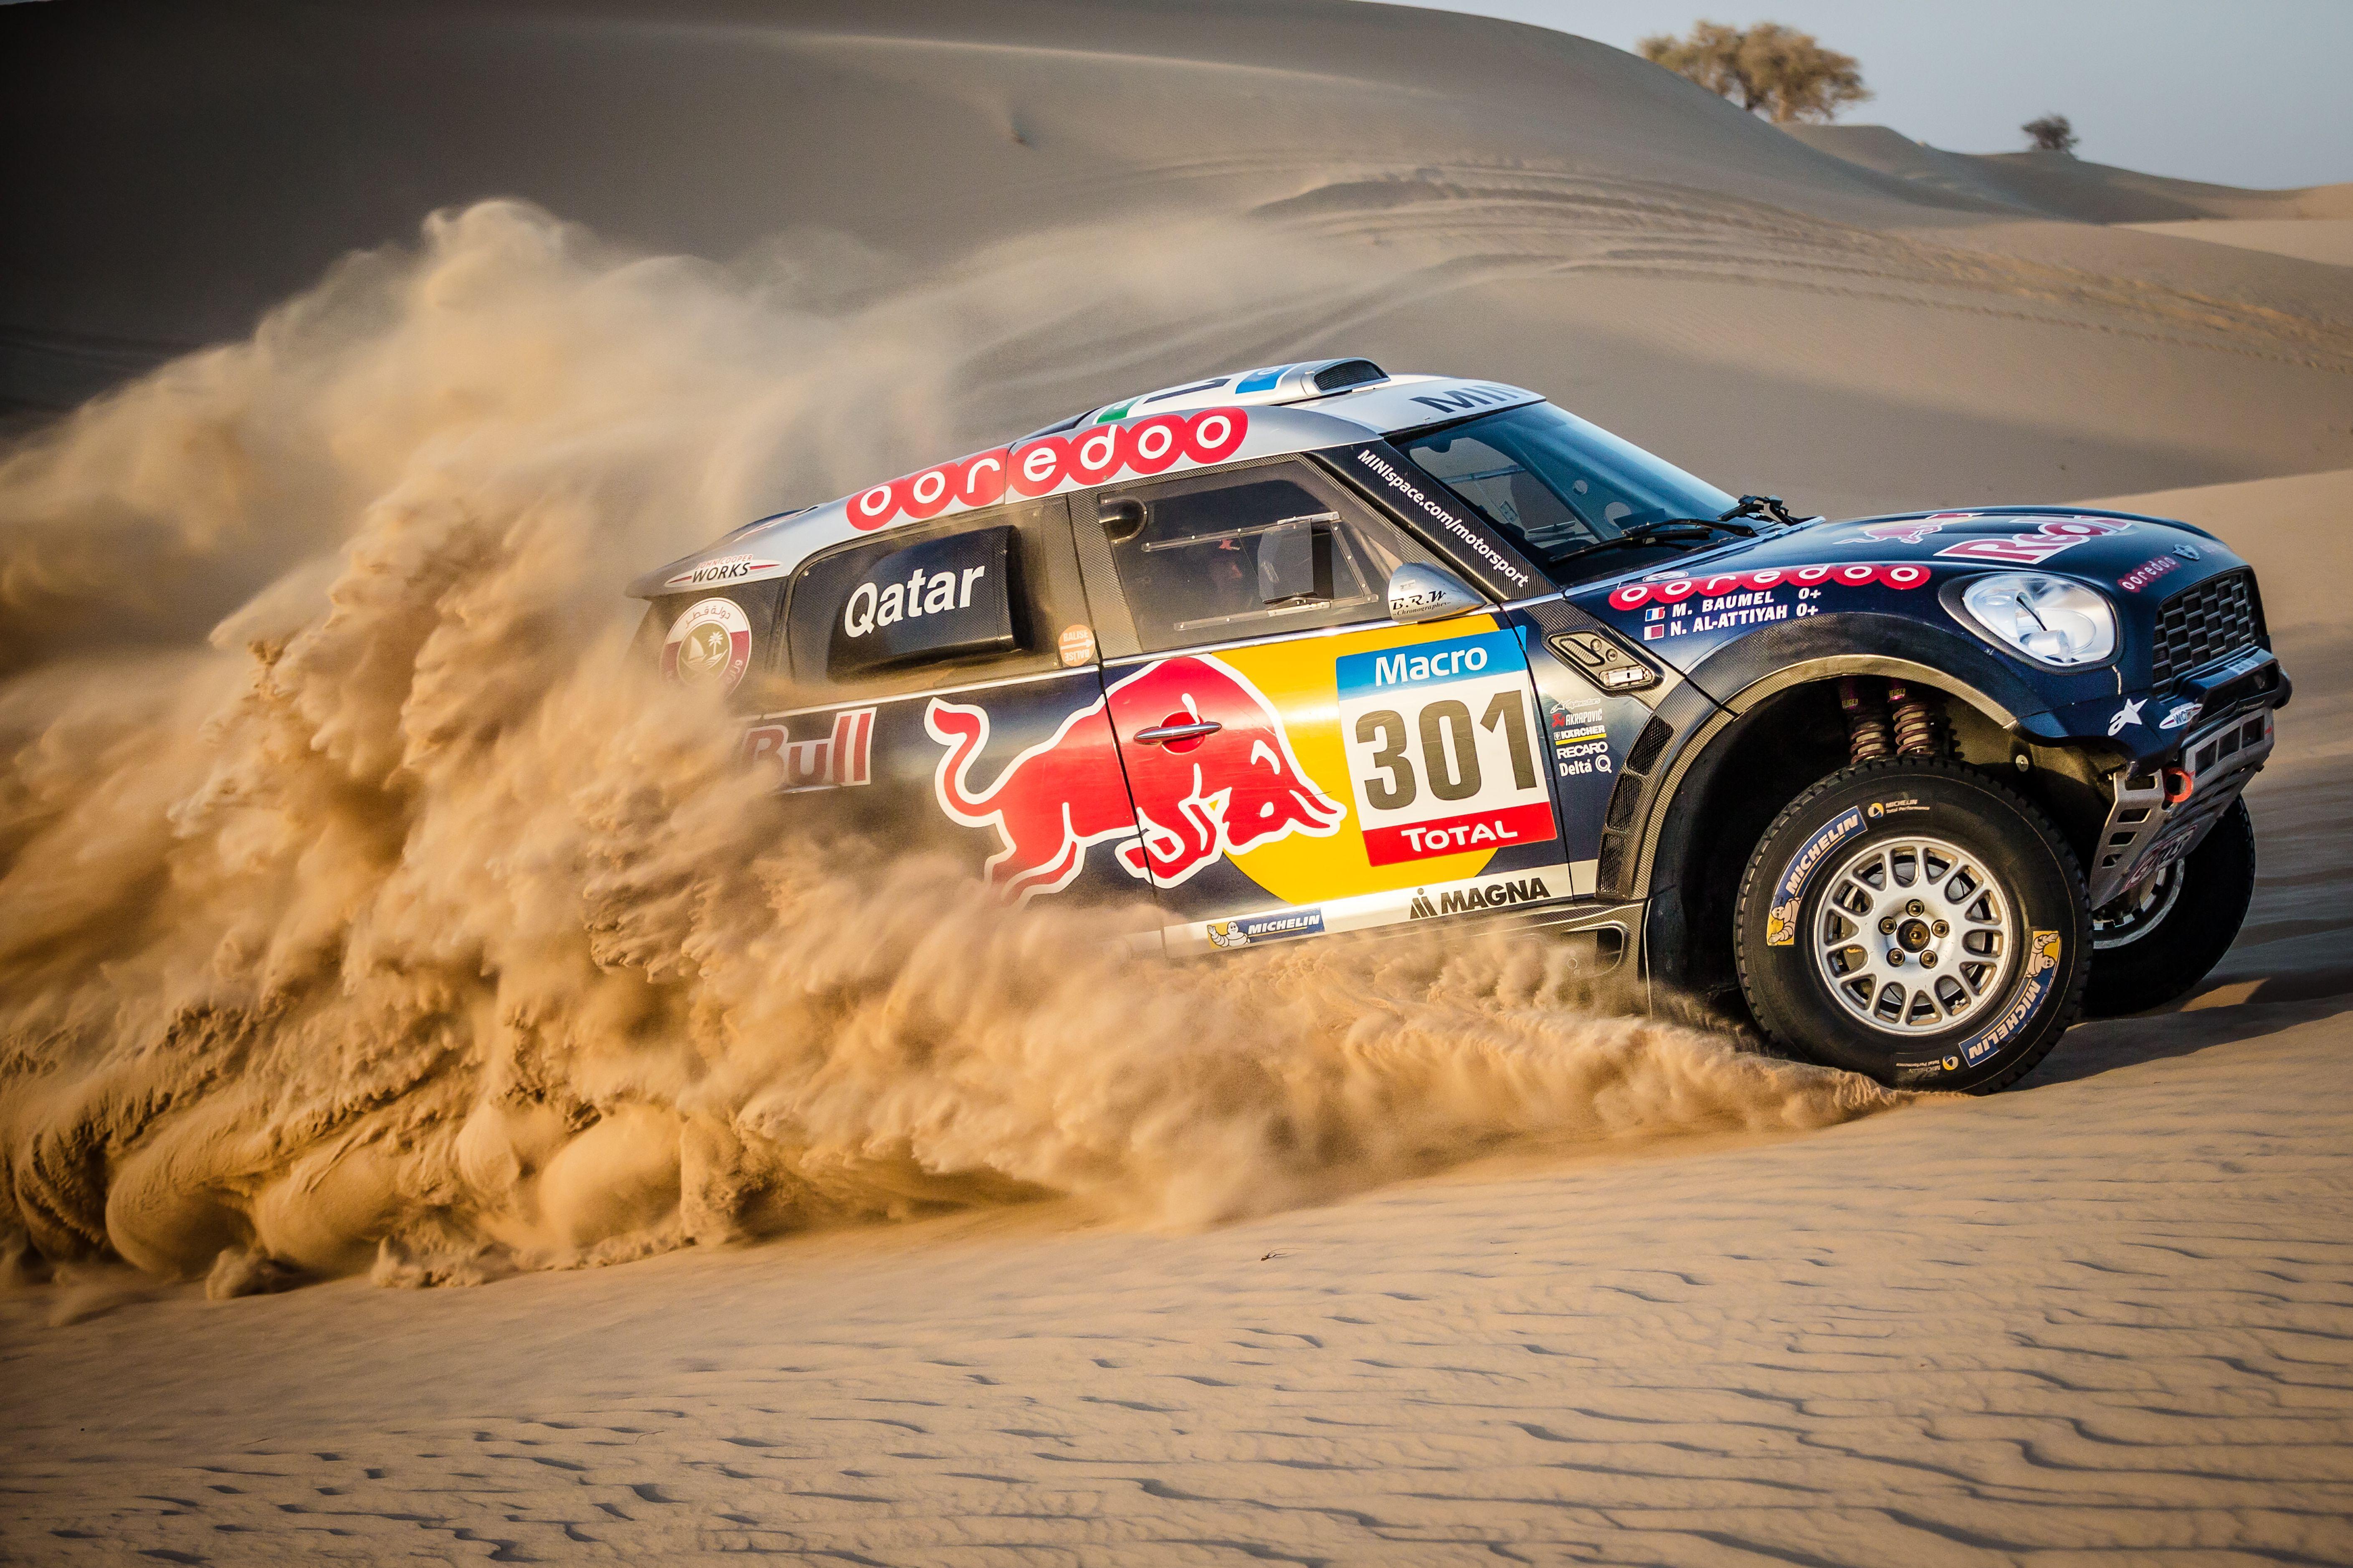 Dakar Wallpapers High Quality | Download Free